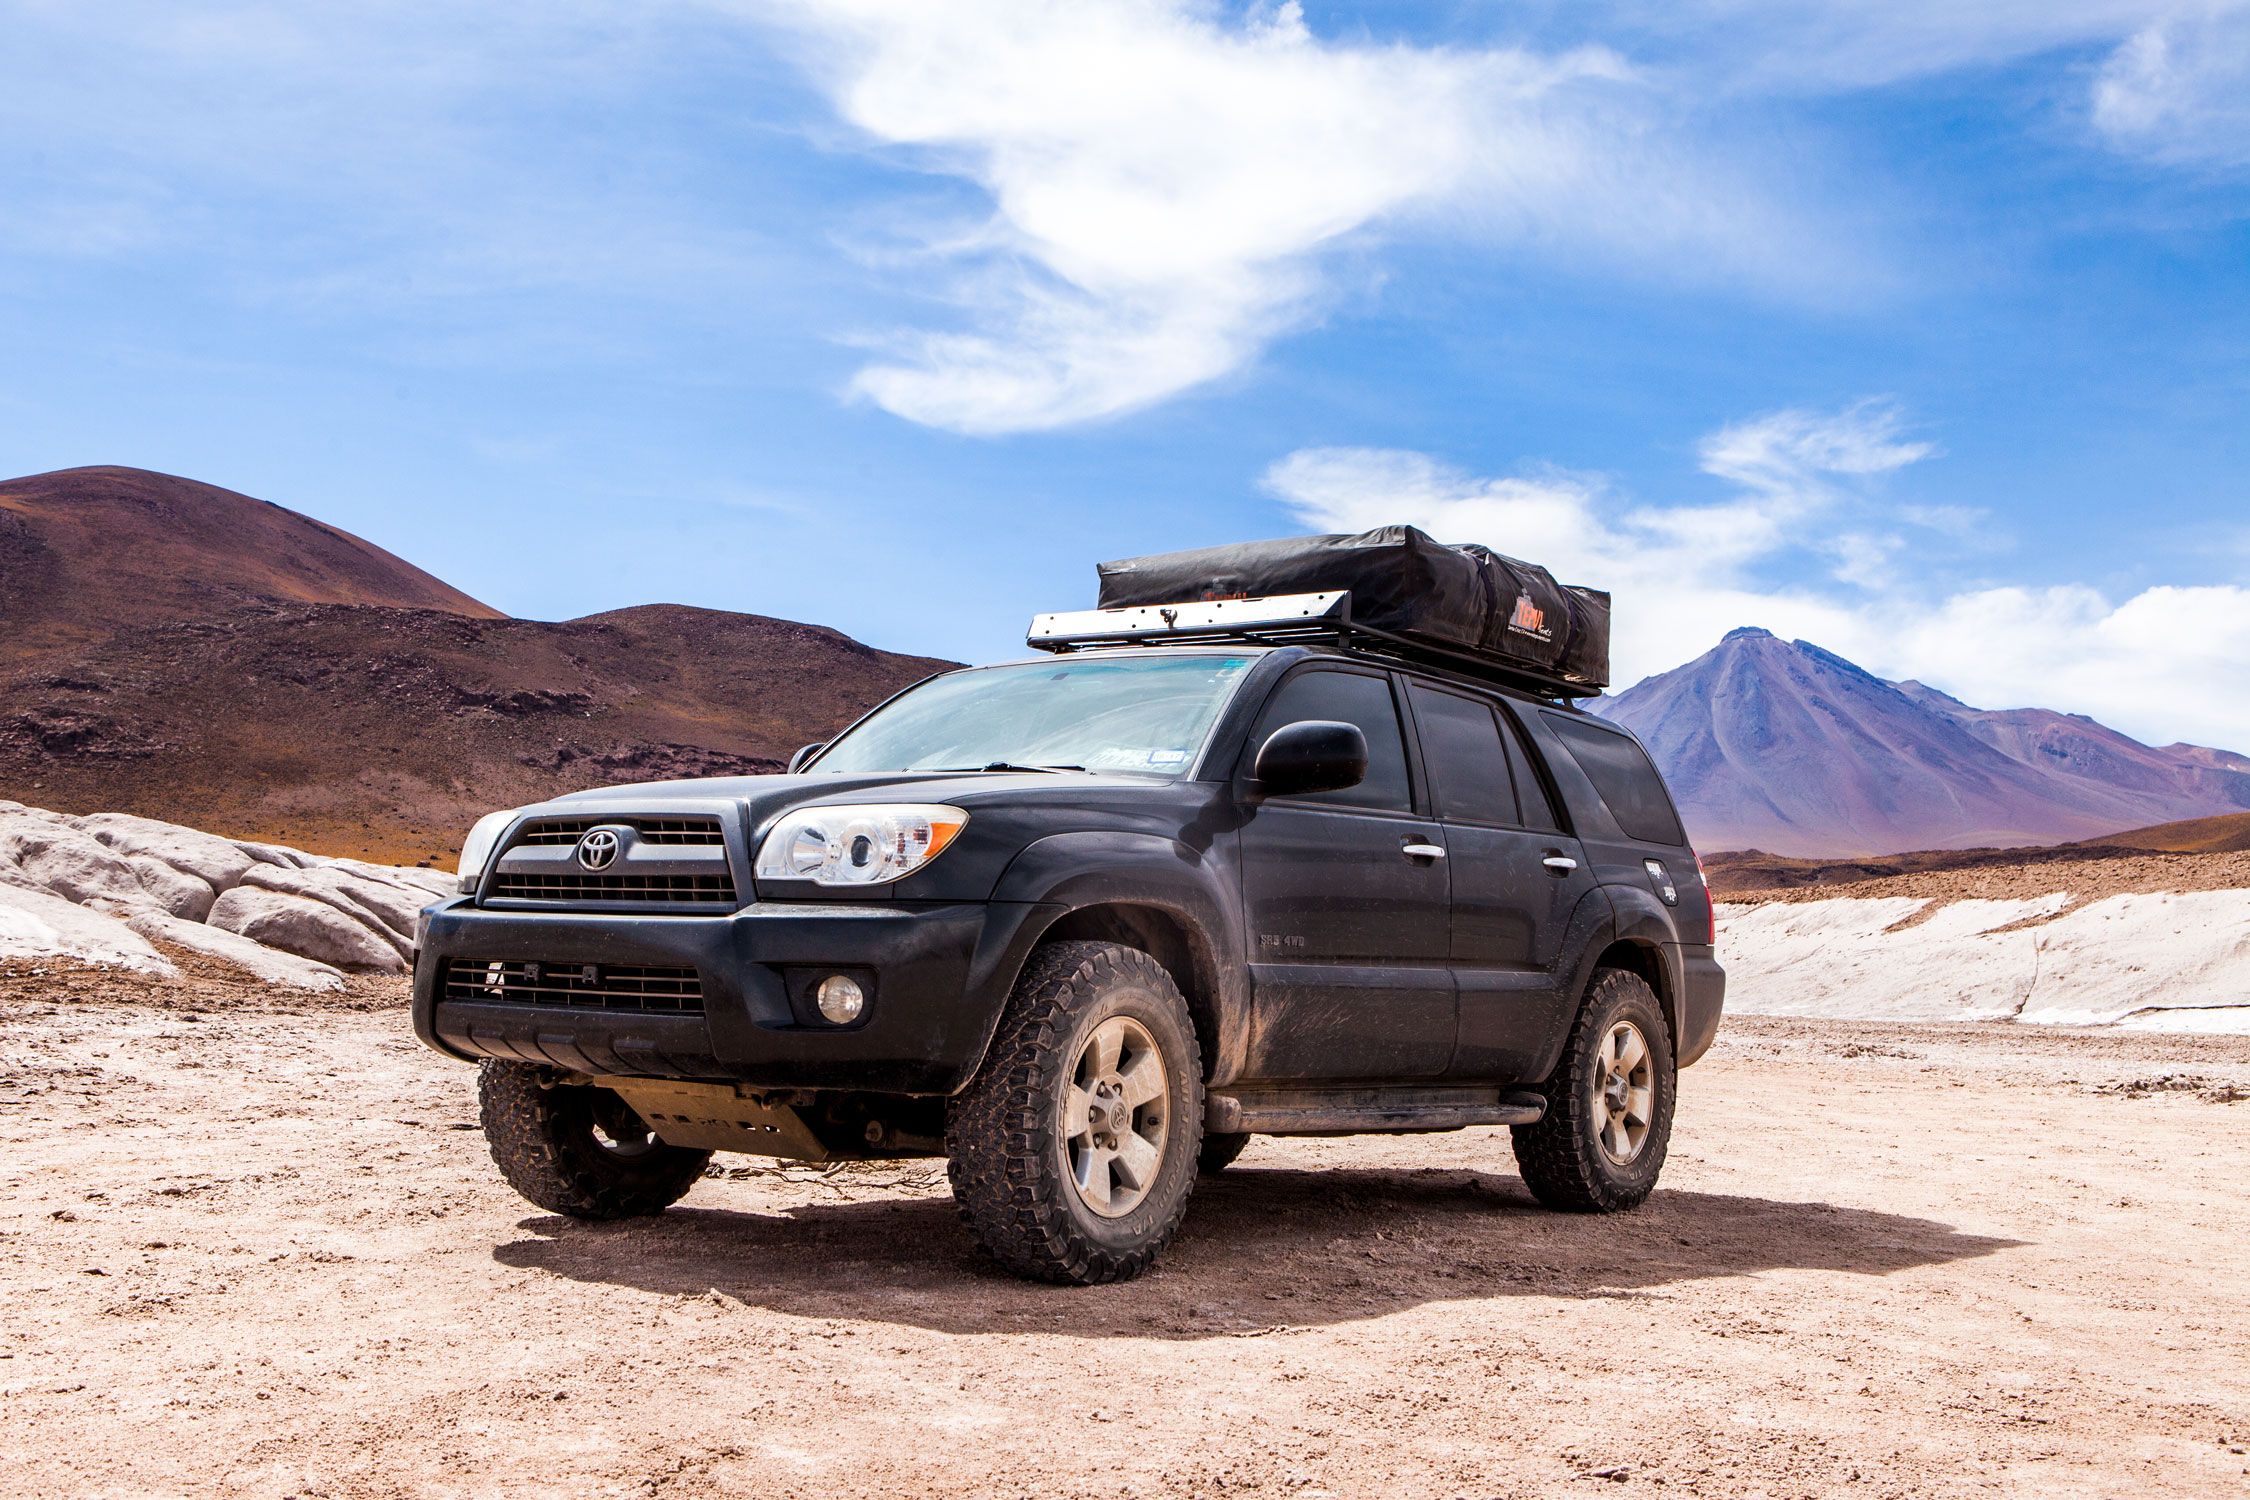 atacama-desert-chile-wander-south-piedras-rojas-4runner-1.jpg